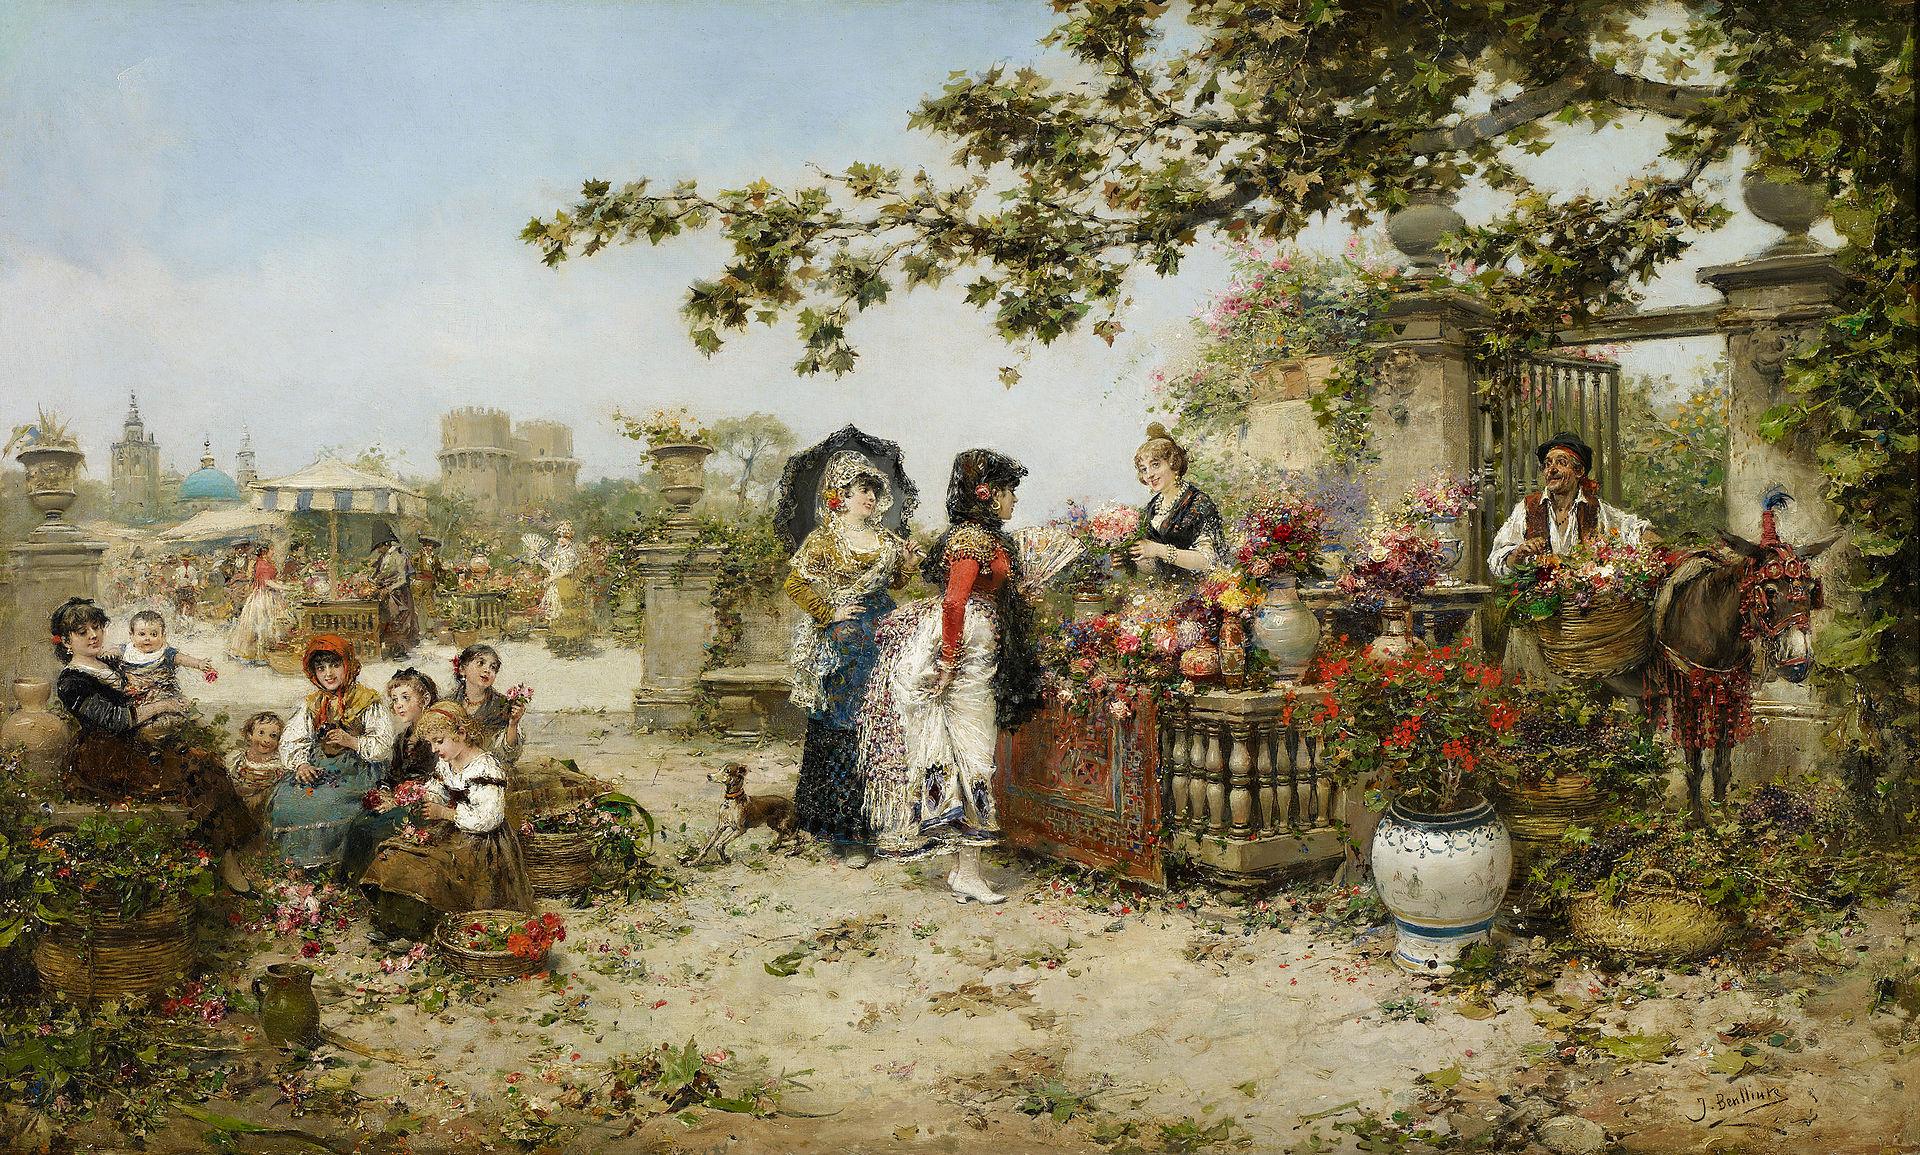 Хосе Бенльюре Жиль Цветок Market.jpg